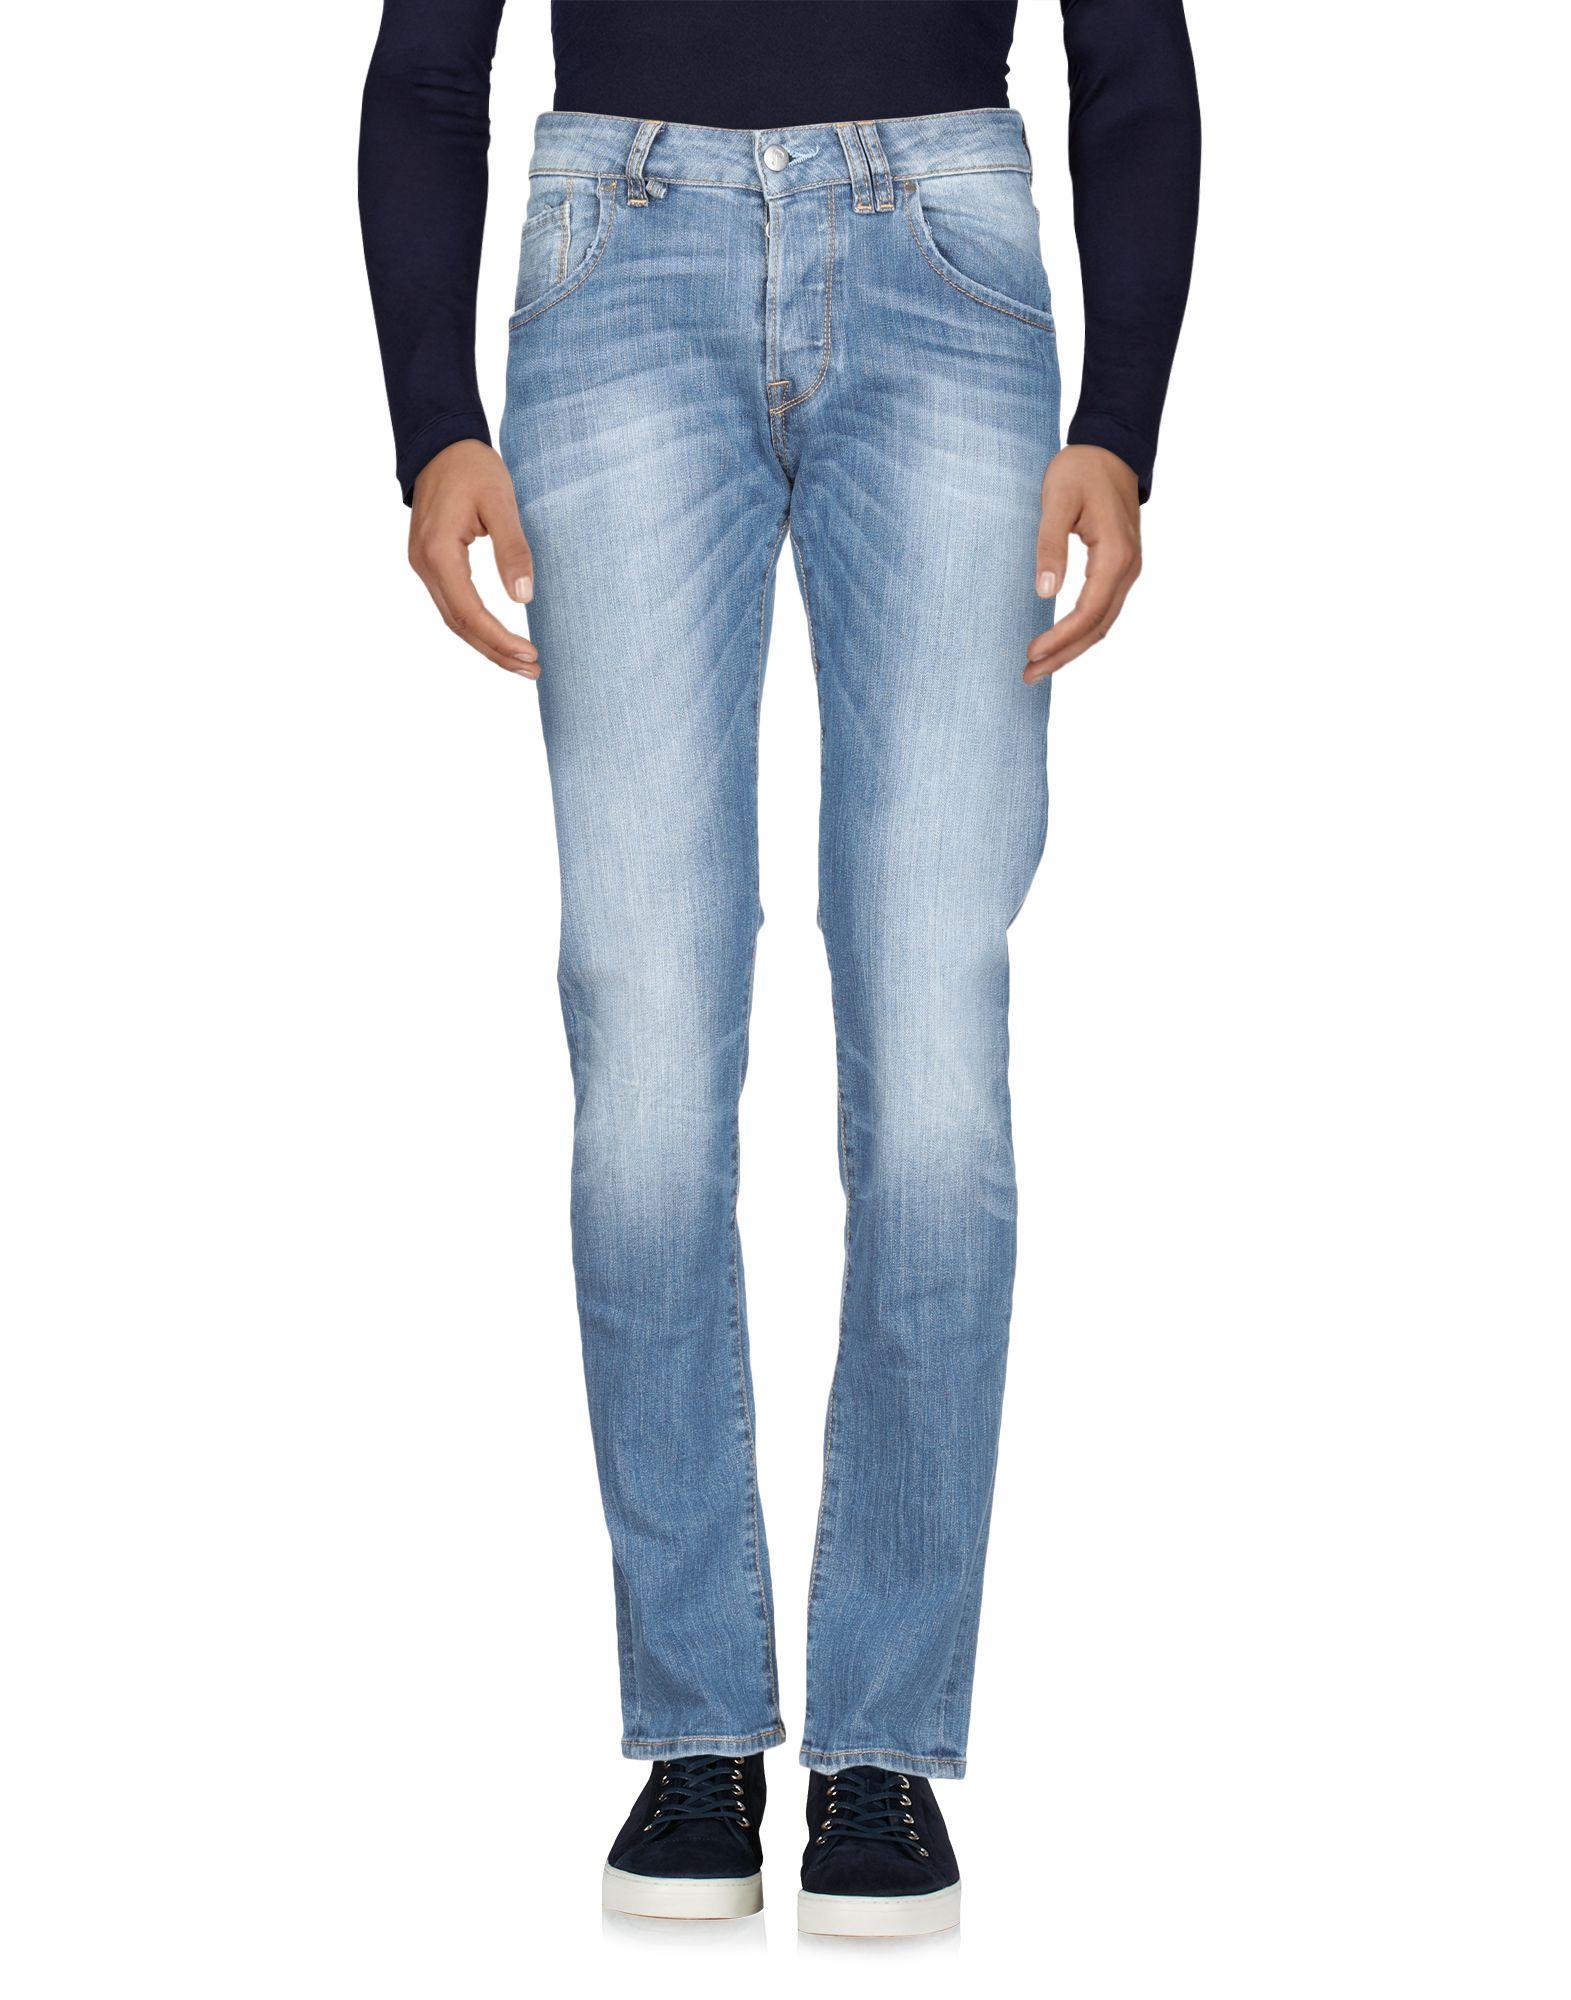 Pantaloni Jeans Jcolor Jcolor Jeans Uomo - 42686077UJ a78706